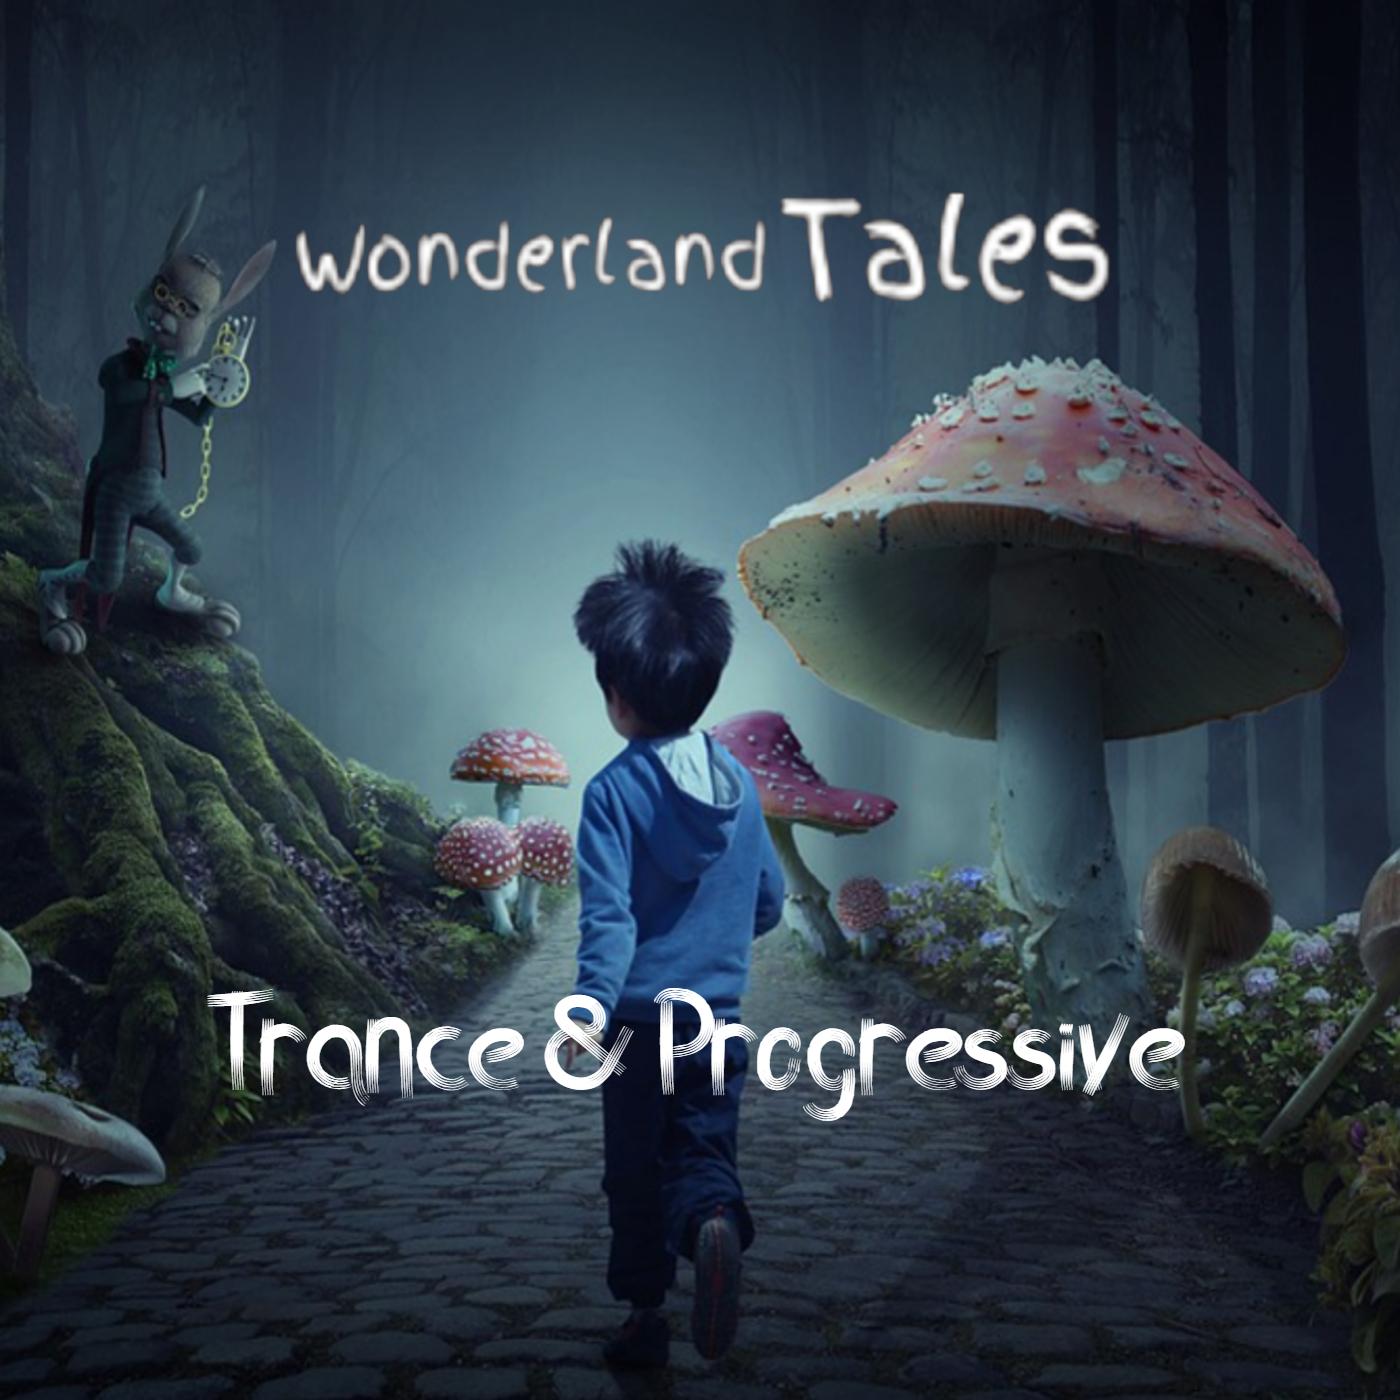 WonderLanD Tales Radio - Emotional Trance & Progressive